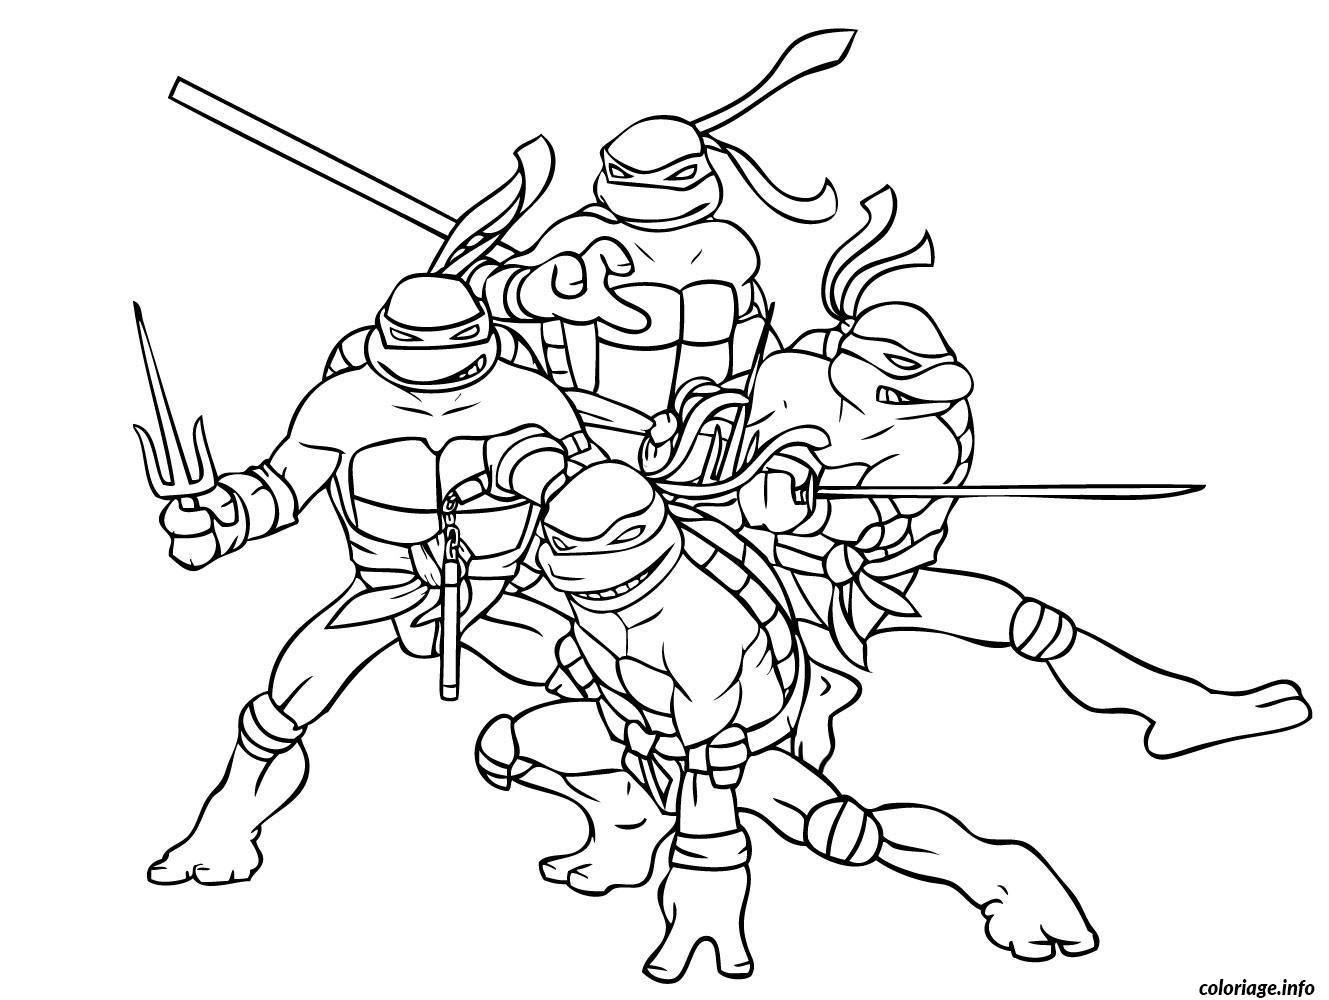 Coloriage Tortue Ninja 6 Dessin À Imprimer | Coloriage destiné Dessin De Tortue Ninja